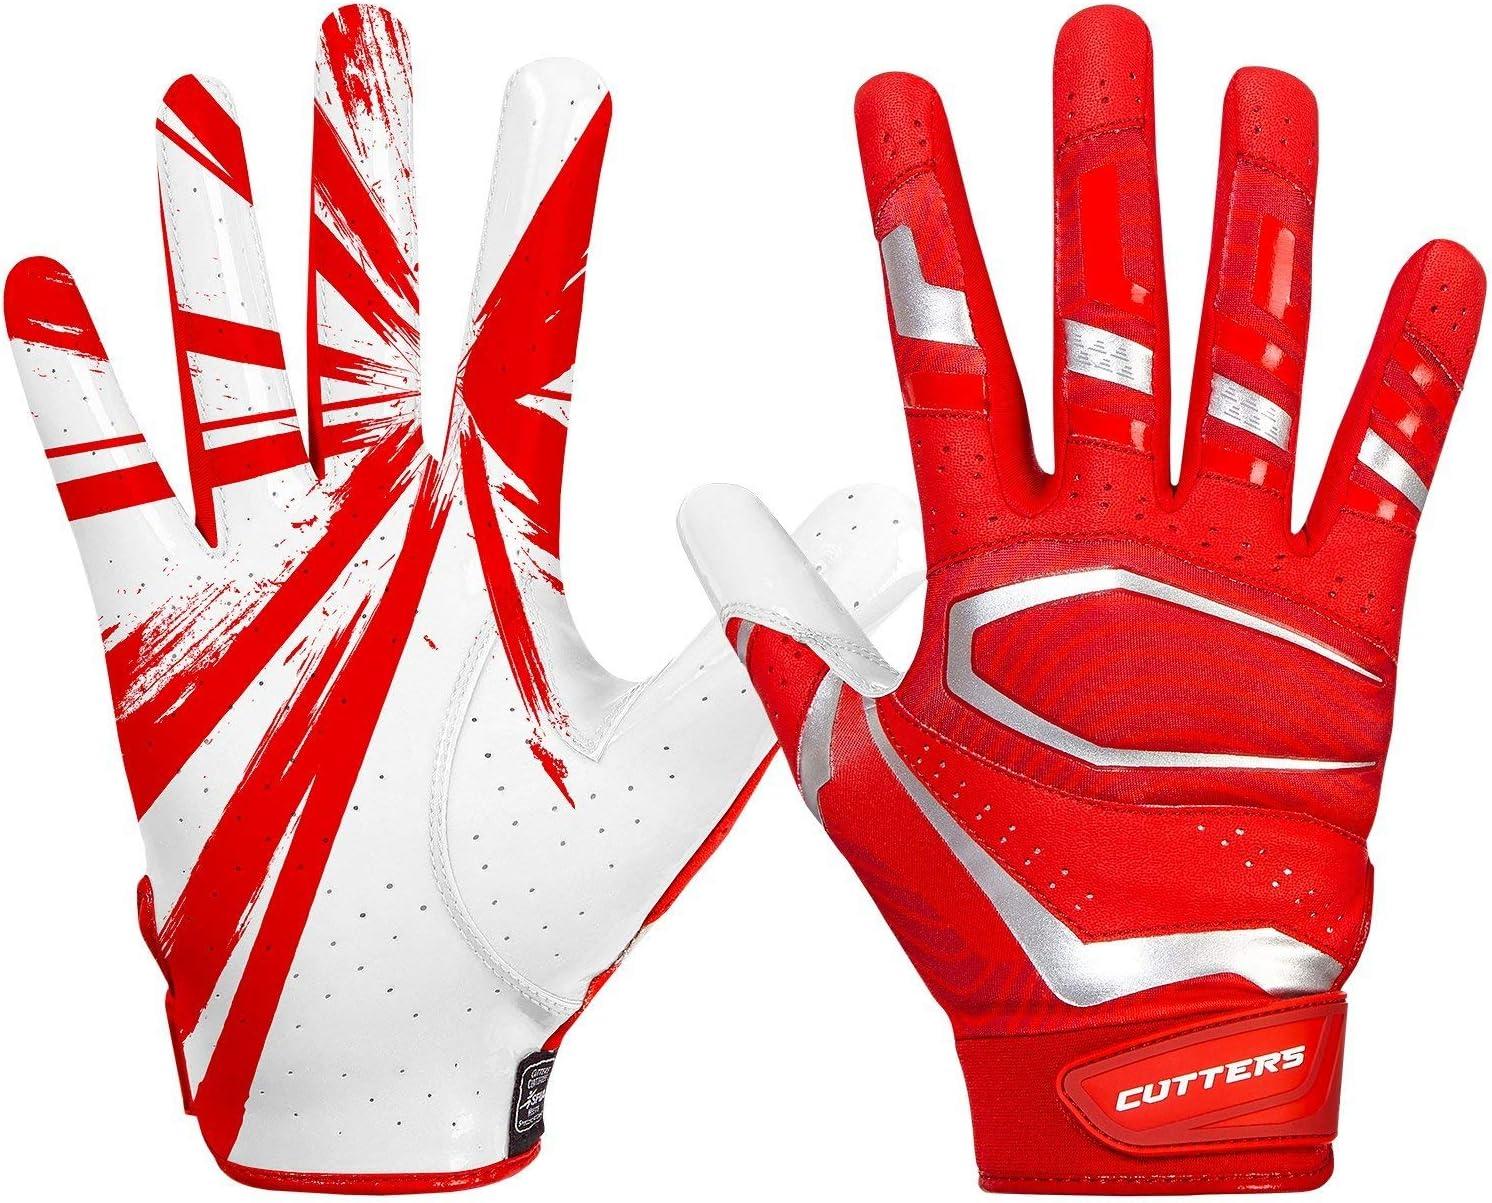 McDavid Rev Pro 3.0 Receiver Gloves レッド/ホワイト Large